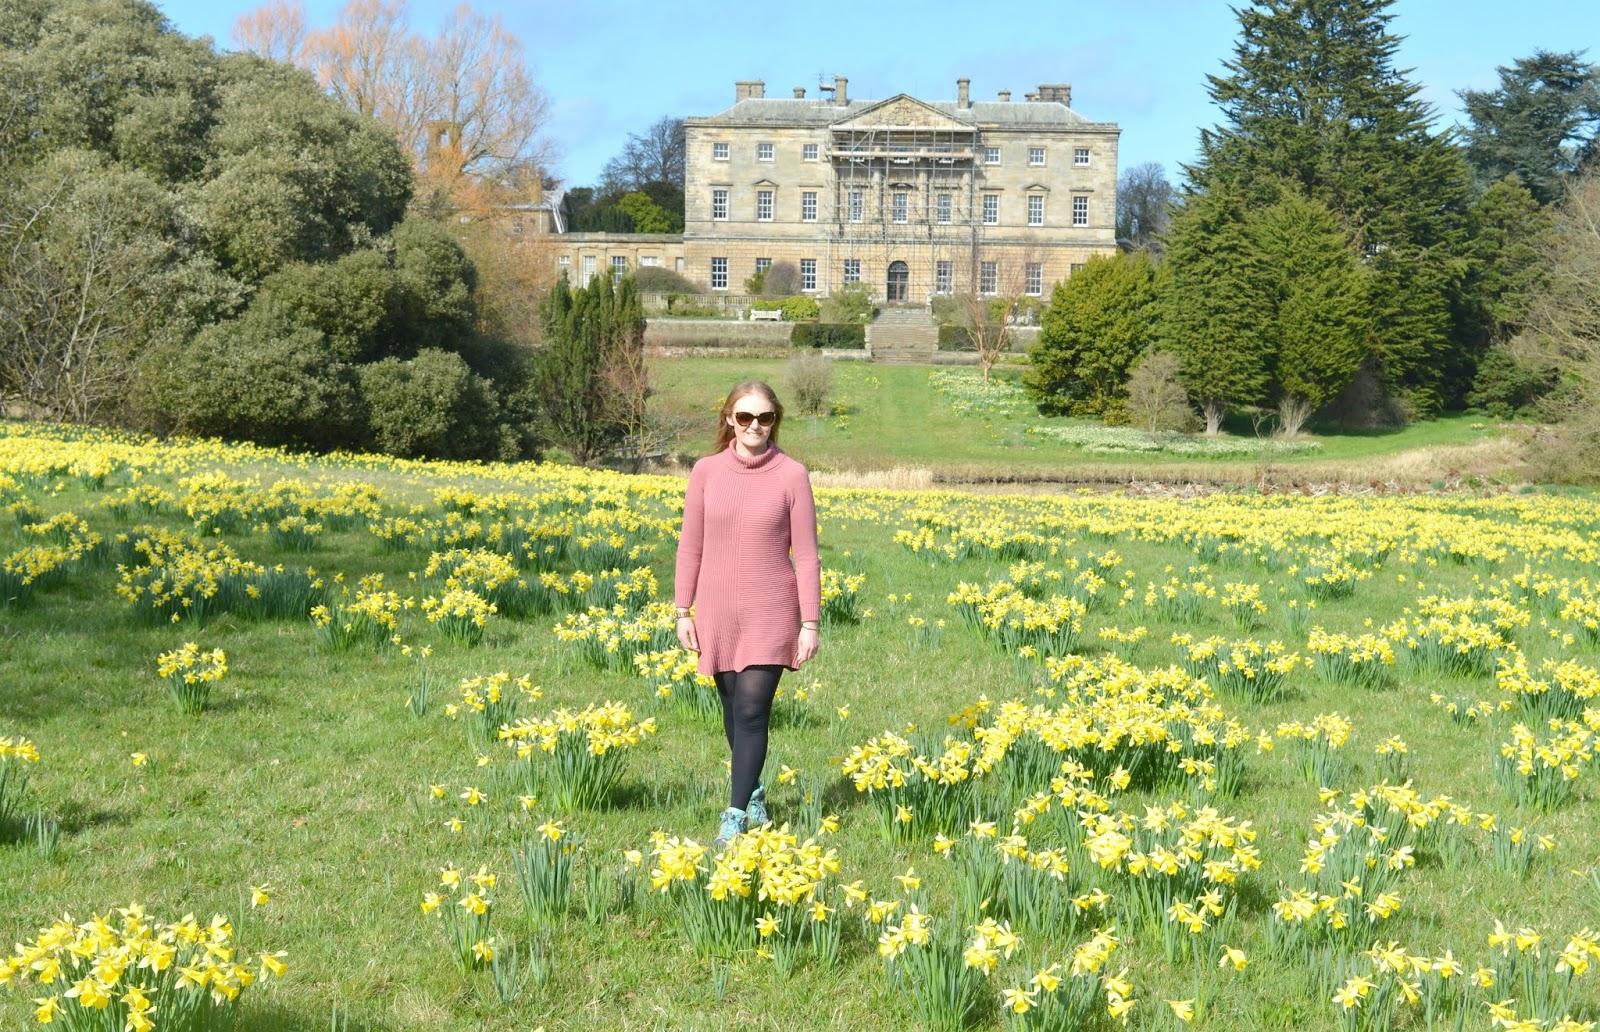 Howick Hall, Northumberland - Daffodils